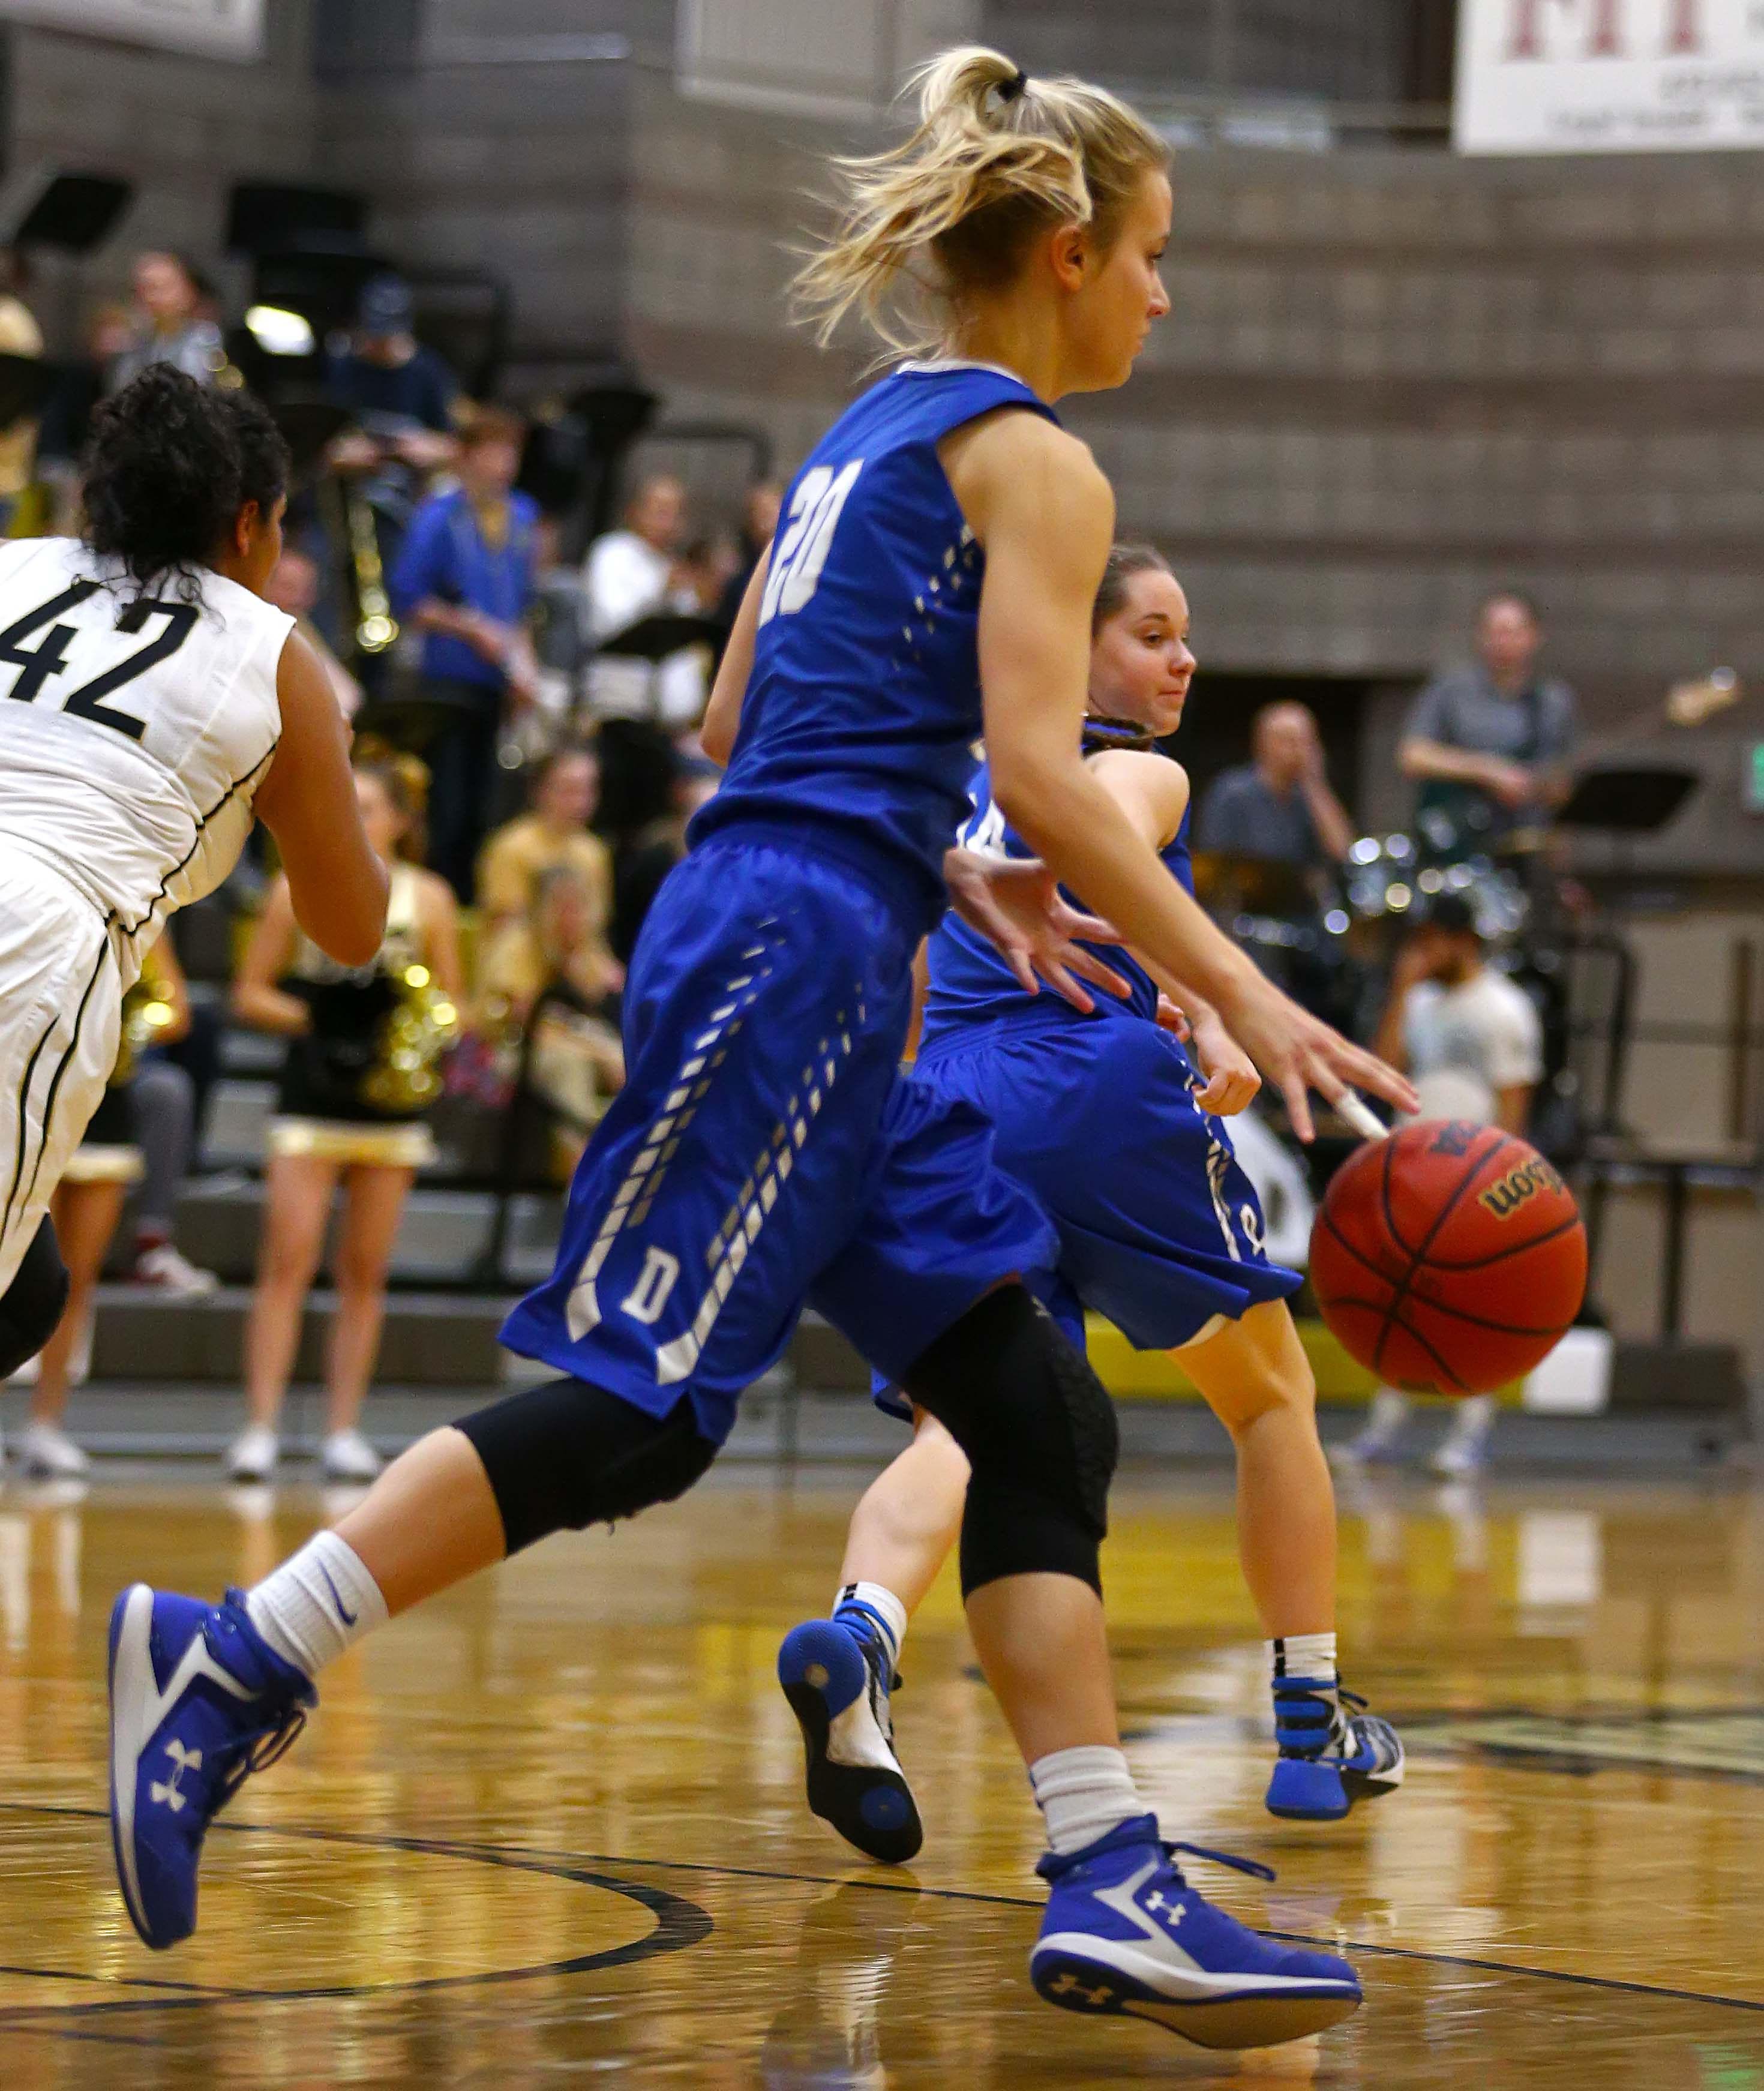 Dixie's Daisy Owens (20), Desert Hills vs. Dixie, Girls Basketball, St. George, Utah, Jan. 12, 2017, | Photo by Robert Hoppie, ASPpix.com, St. George News